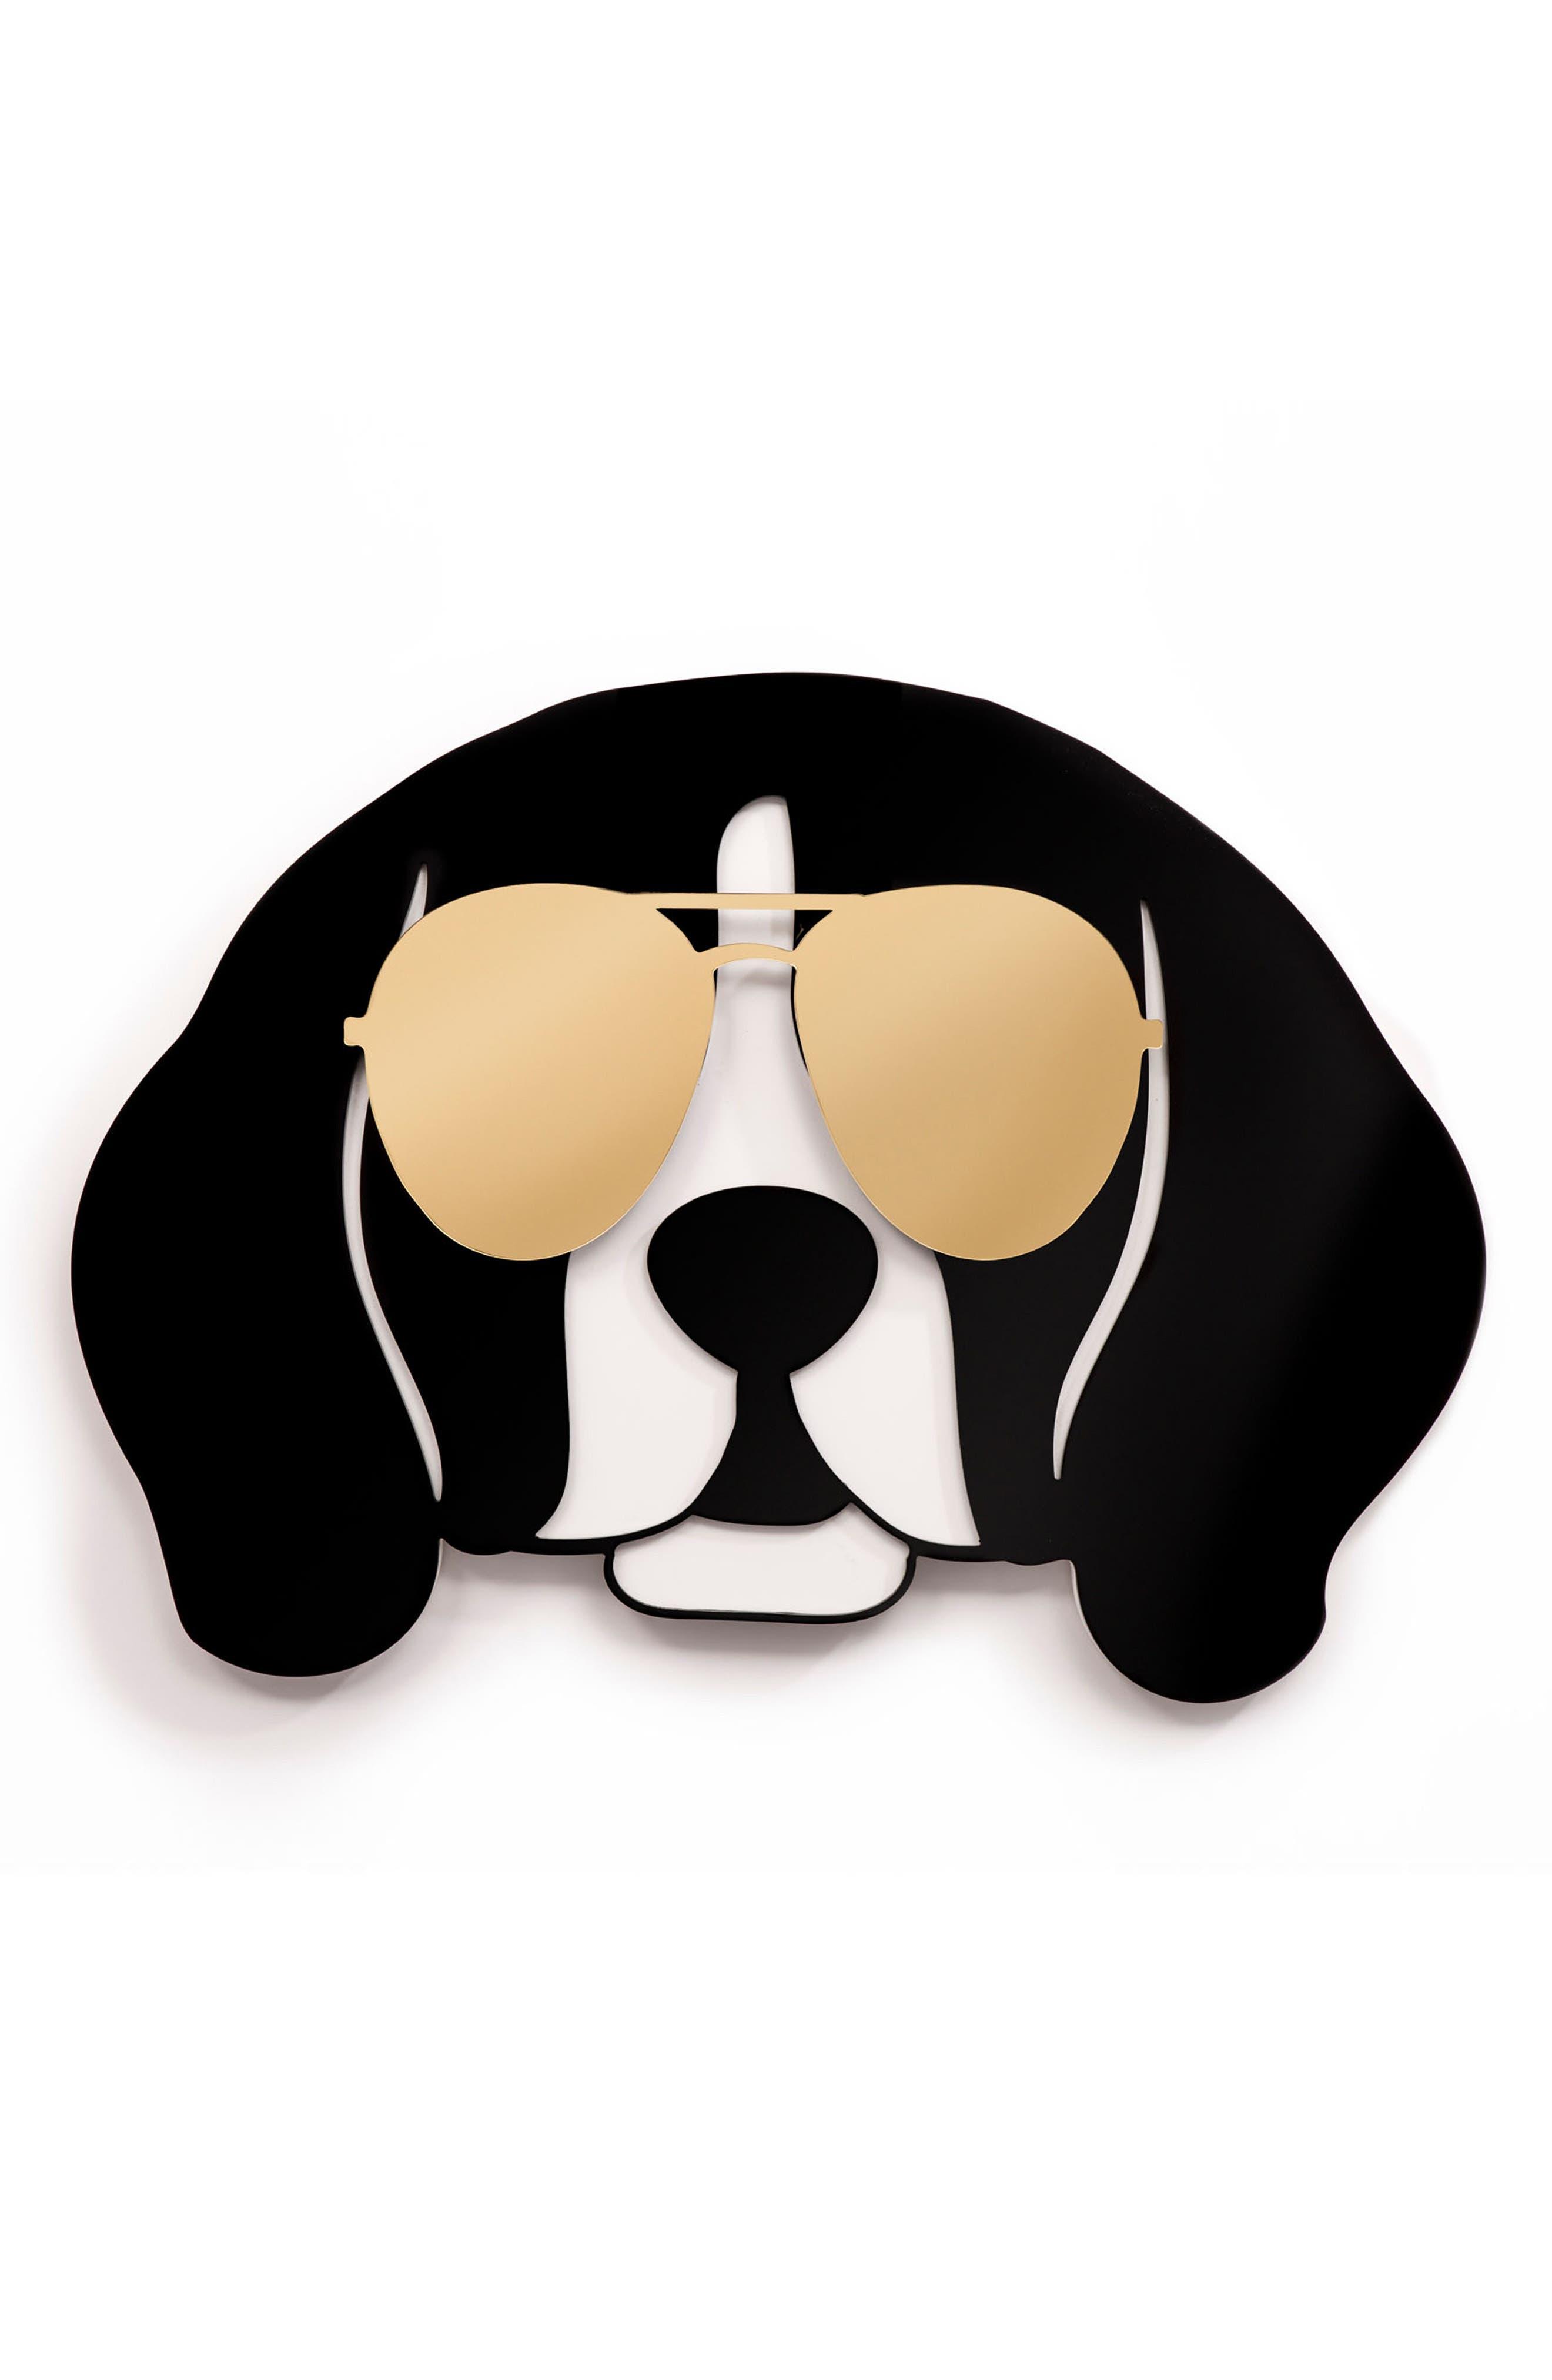 Cool Beagle Wall Art,                             Main thumbnail 1, color,                             GOLD BLACK AND WHITE